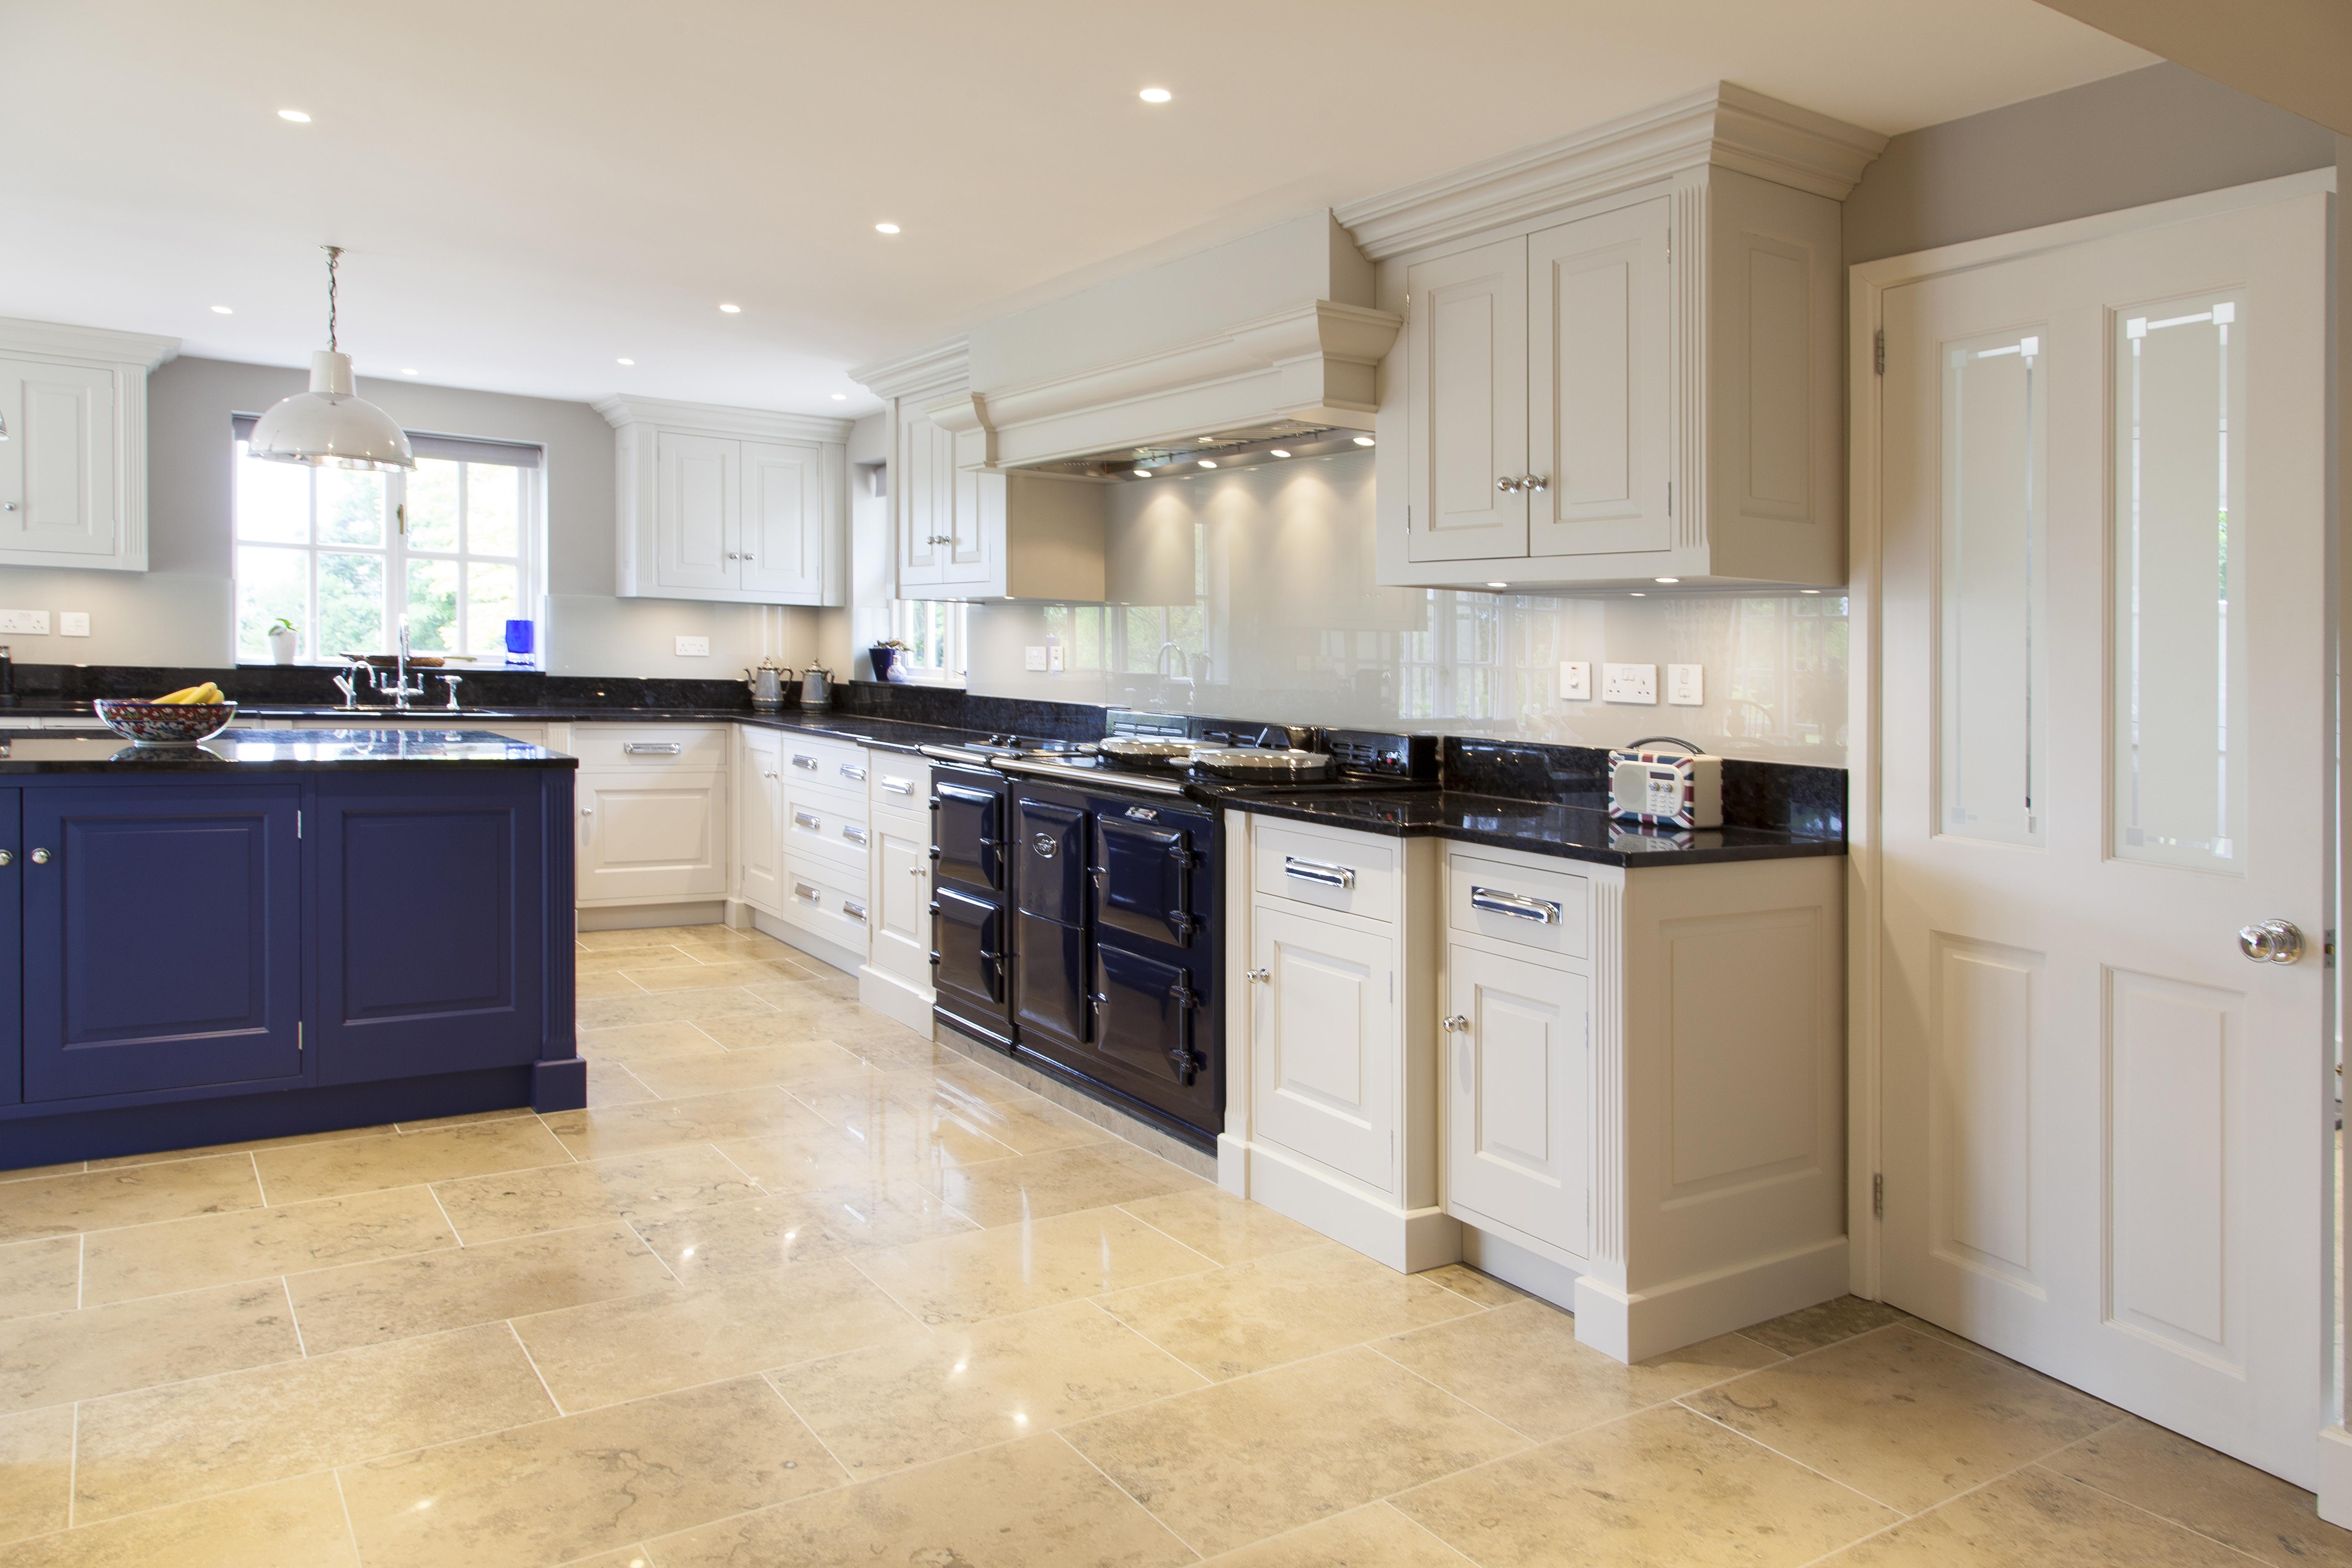 Grand Style bespoke kitchen with glass splashbacks and galaxy black granite countertops